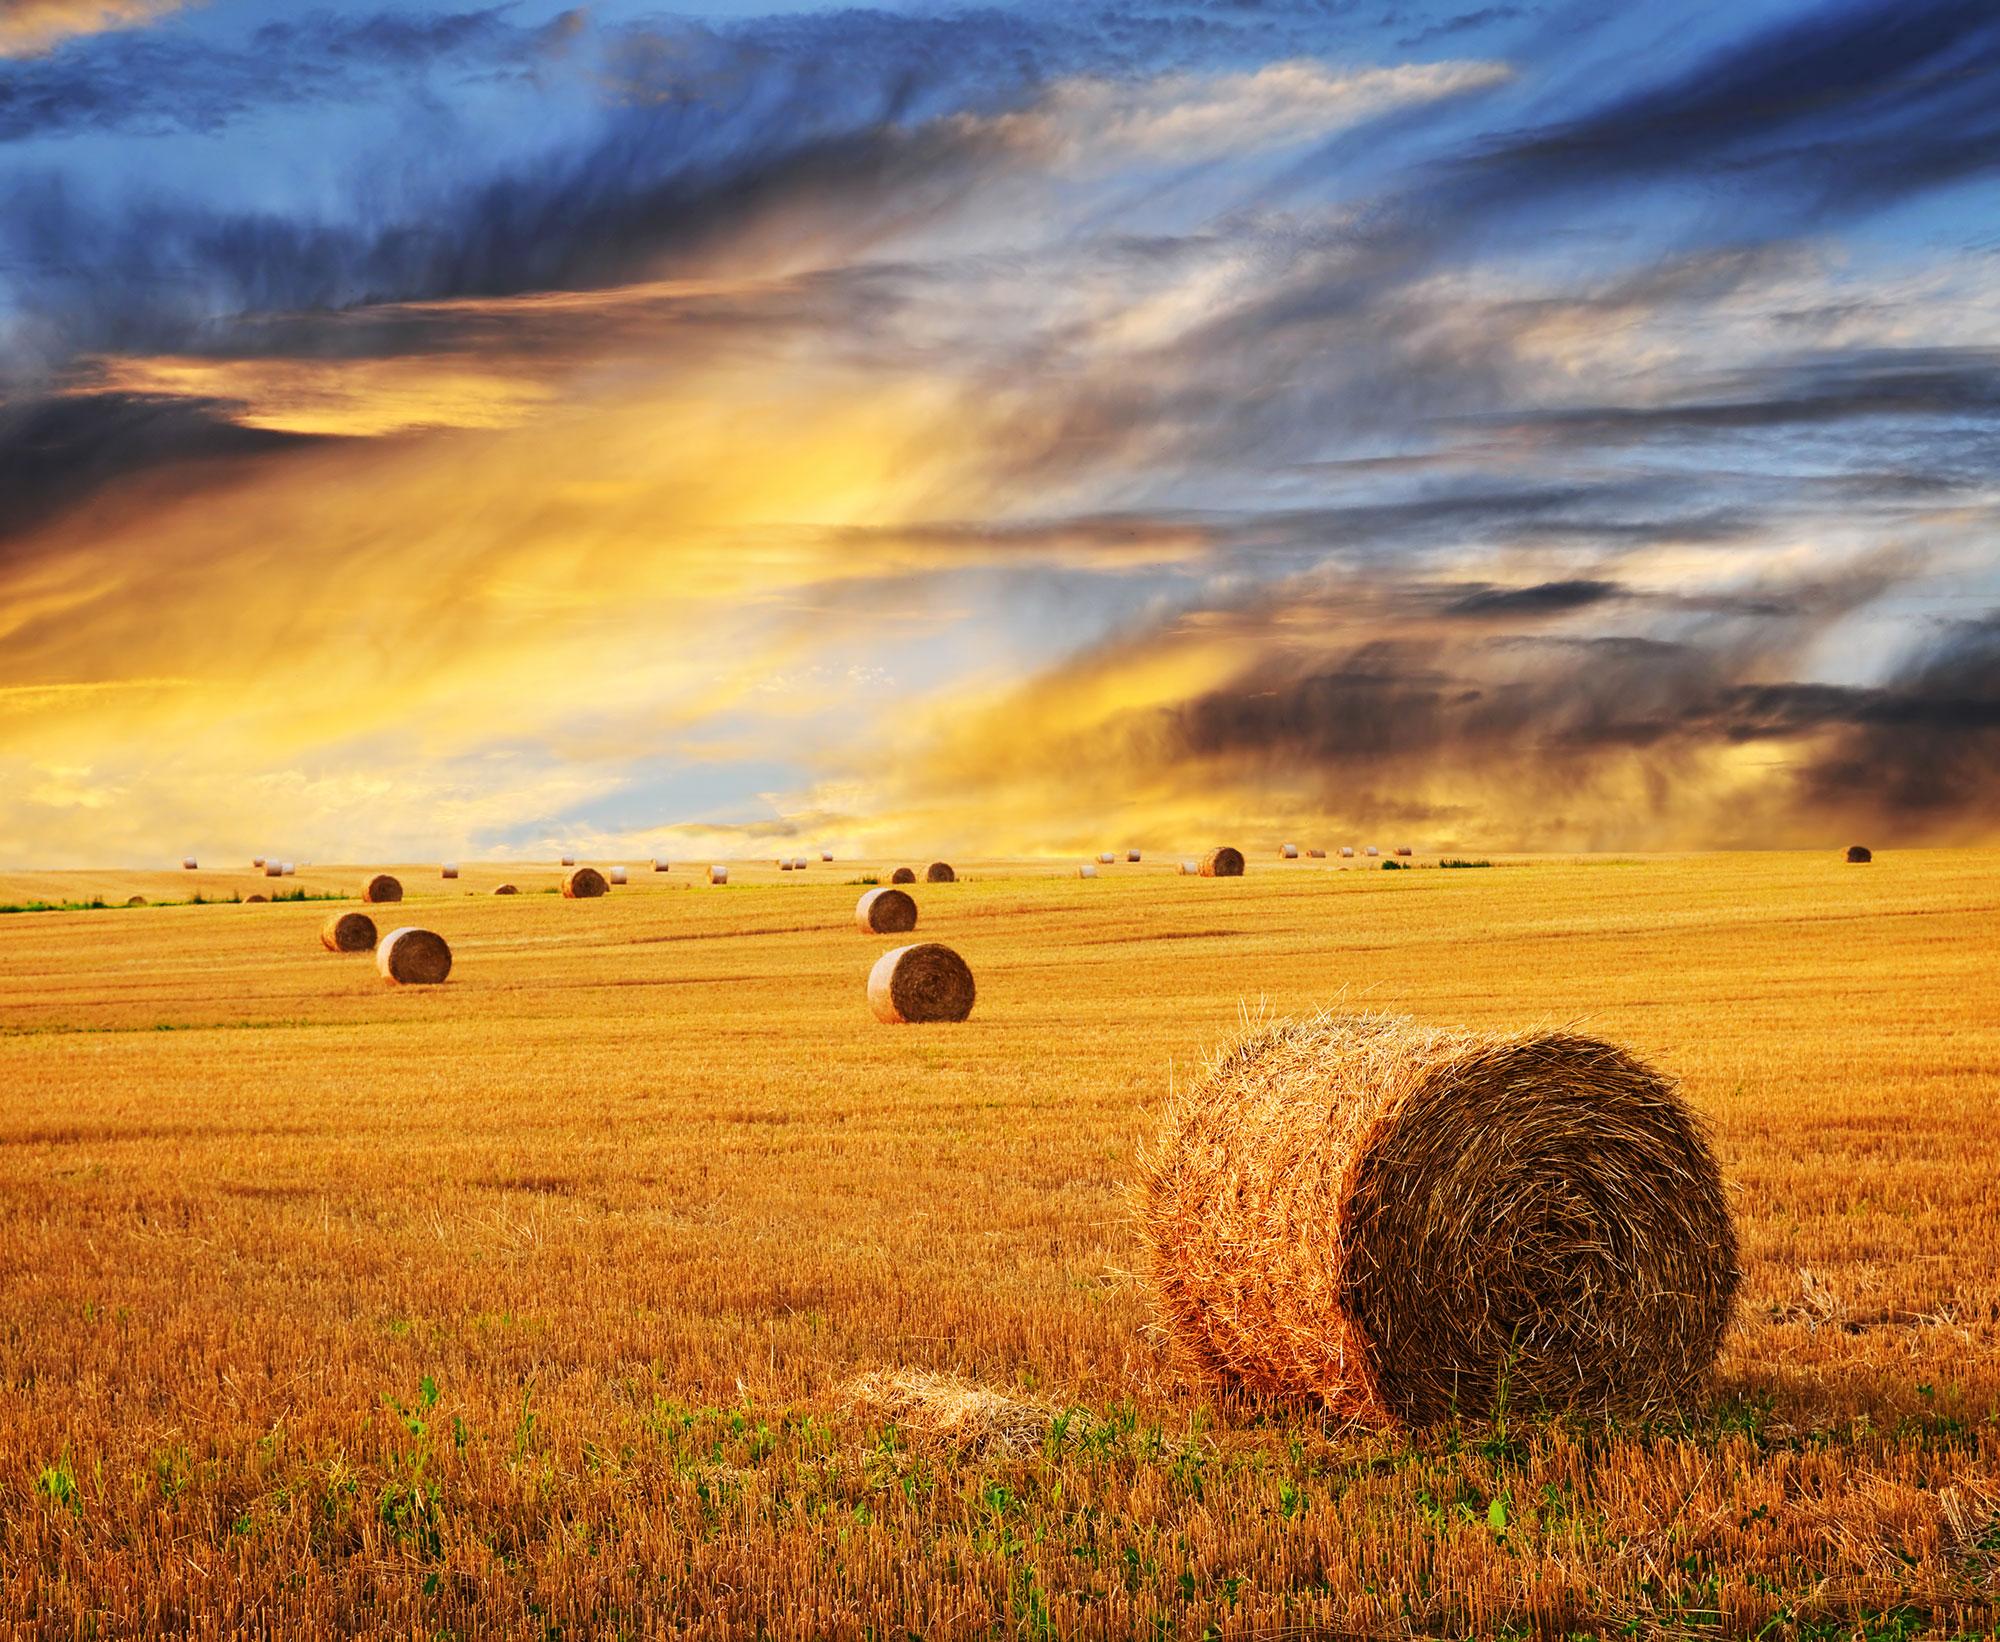 bigstock-Golden-Sunset-Over-Farm-Field-6813037.jpg